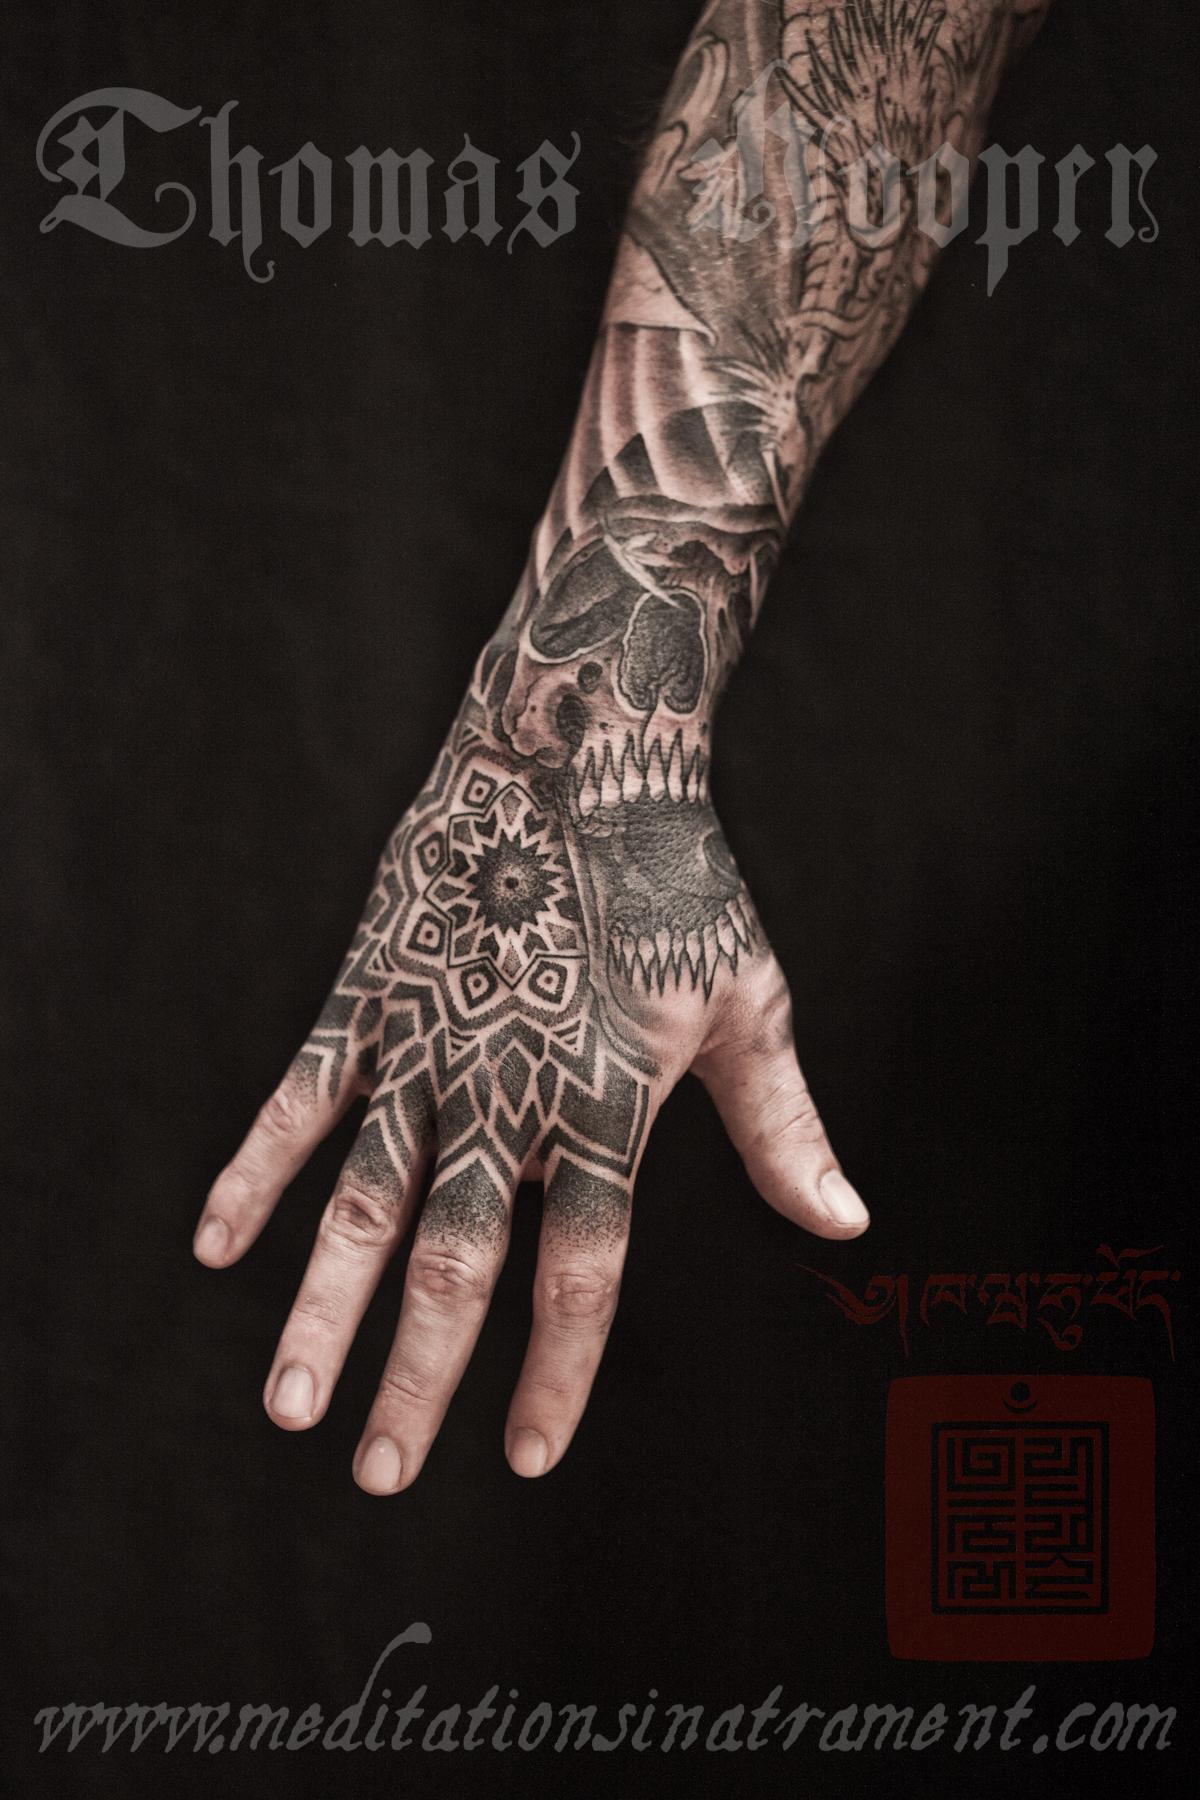 Freaky hand tattoo mandalas from New York City! Skull-hexahedron-and-mandala-hand-tattoo-thomas-hooper-008-august-02-2011